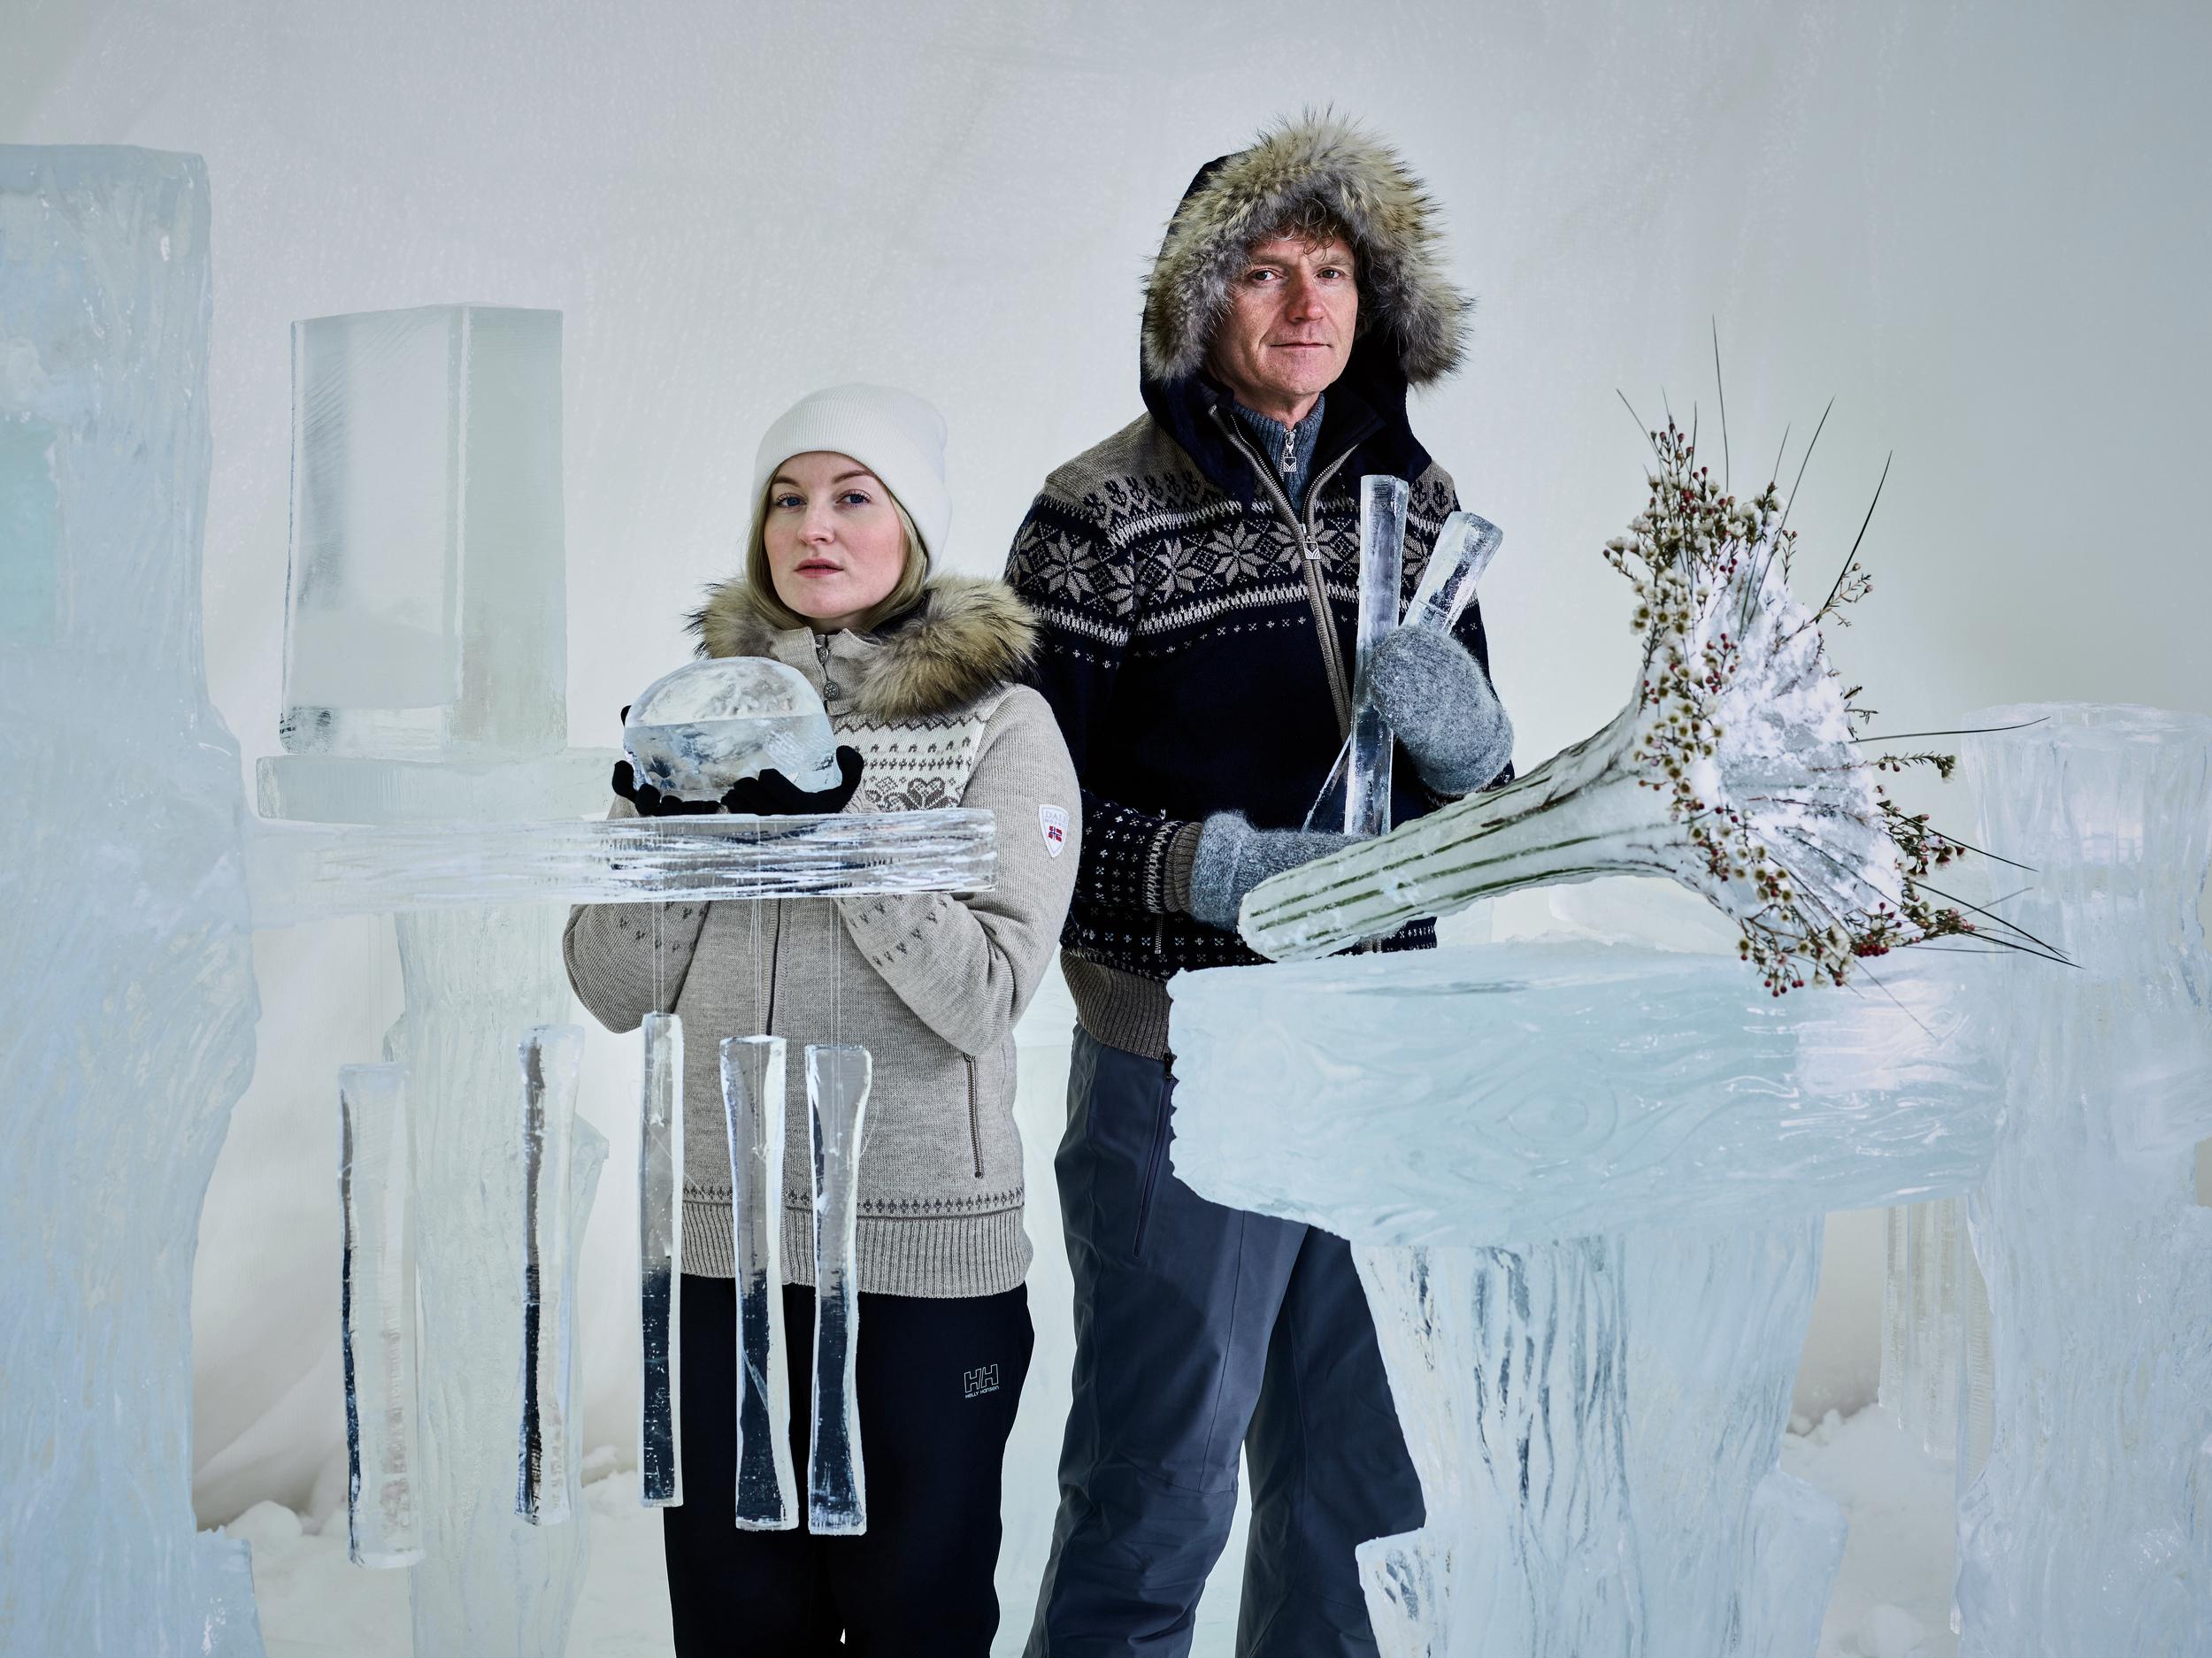 Icemusic 2016 Terje Isungset & Maria Skranes.Photo by Emile Holba.jpg